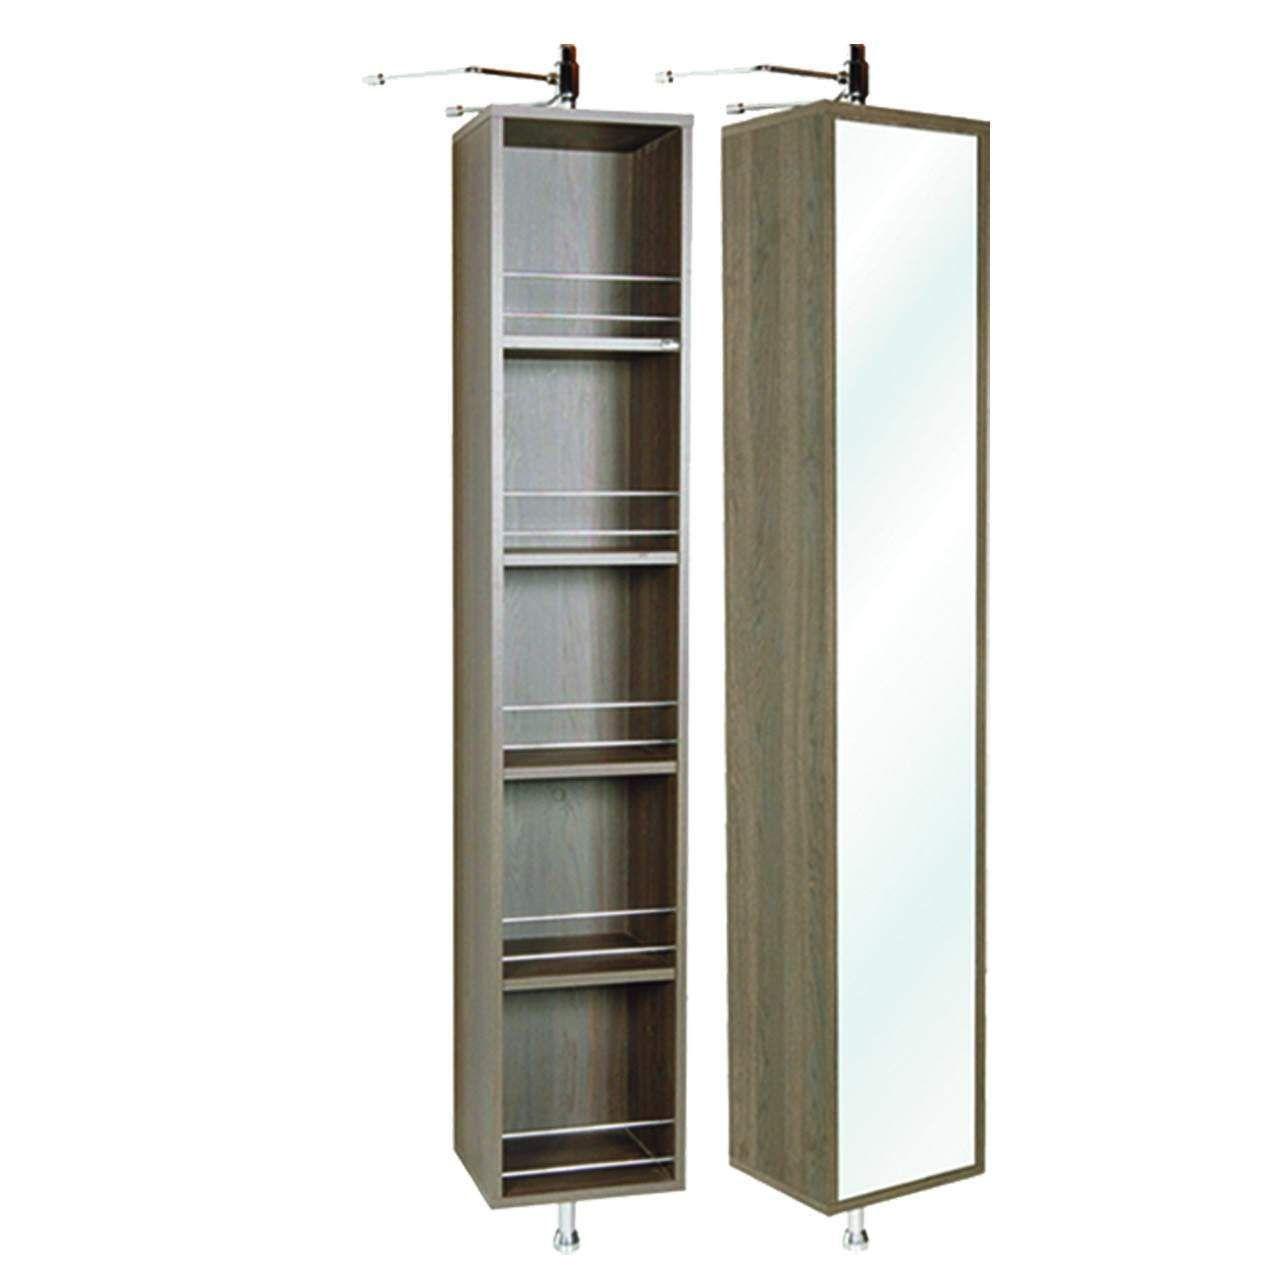 Rotating bath mirror with shelf google search